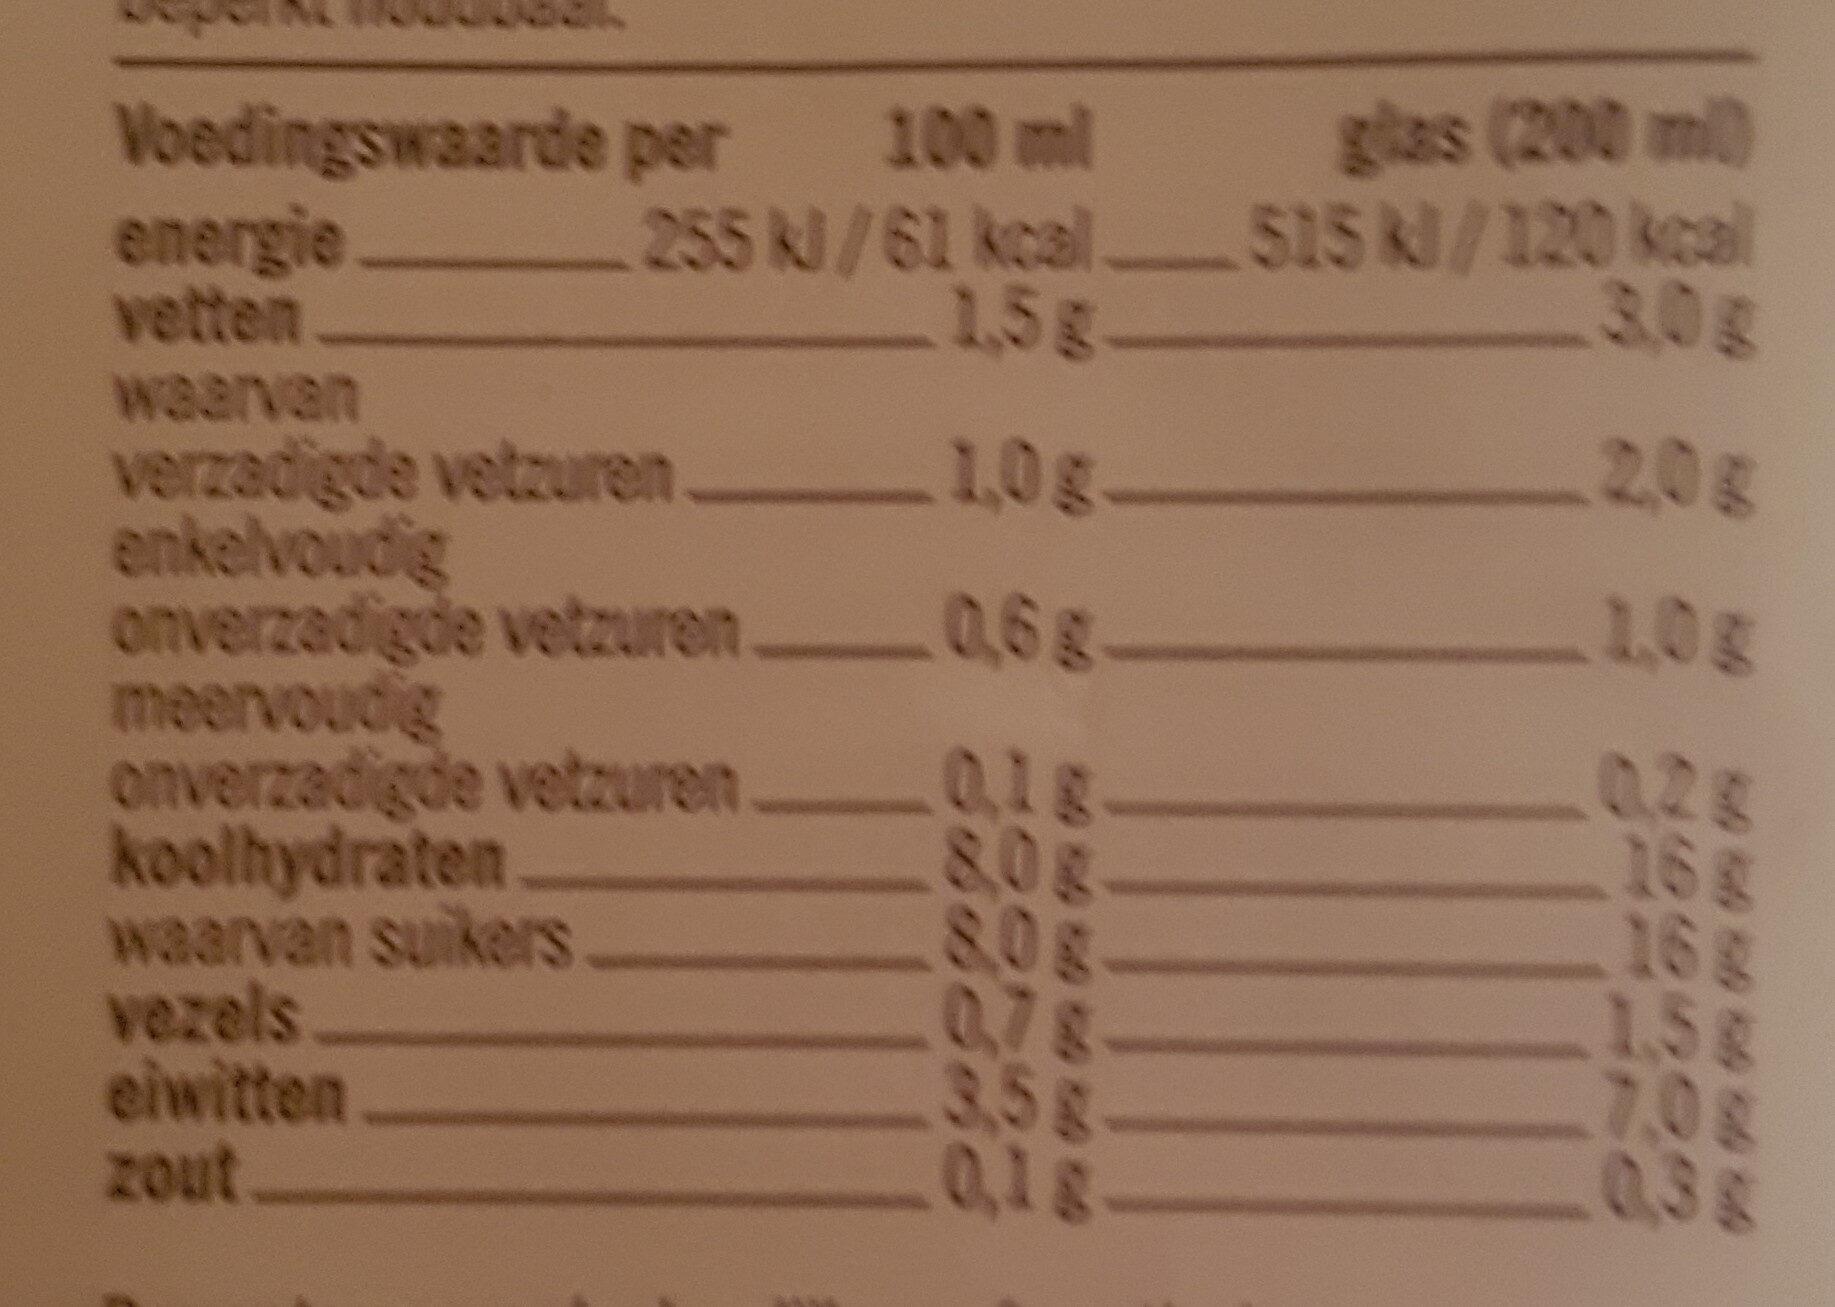 chocolade melk halfvolle - Voedingswaarden - nl